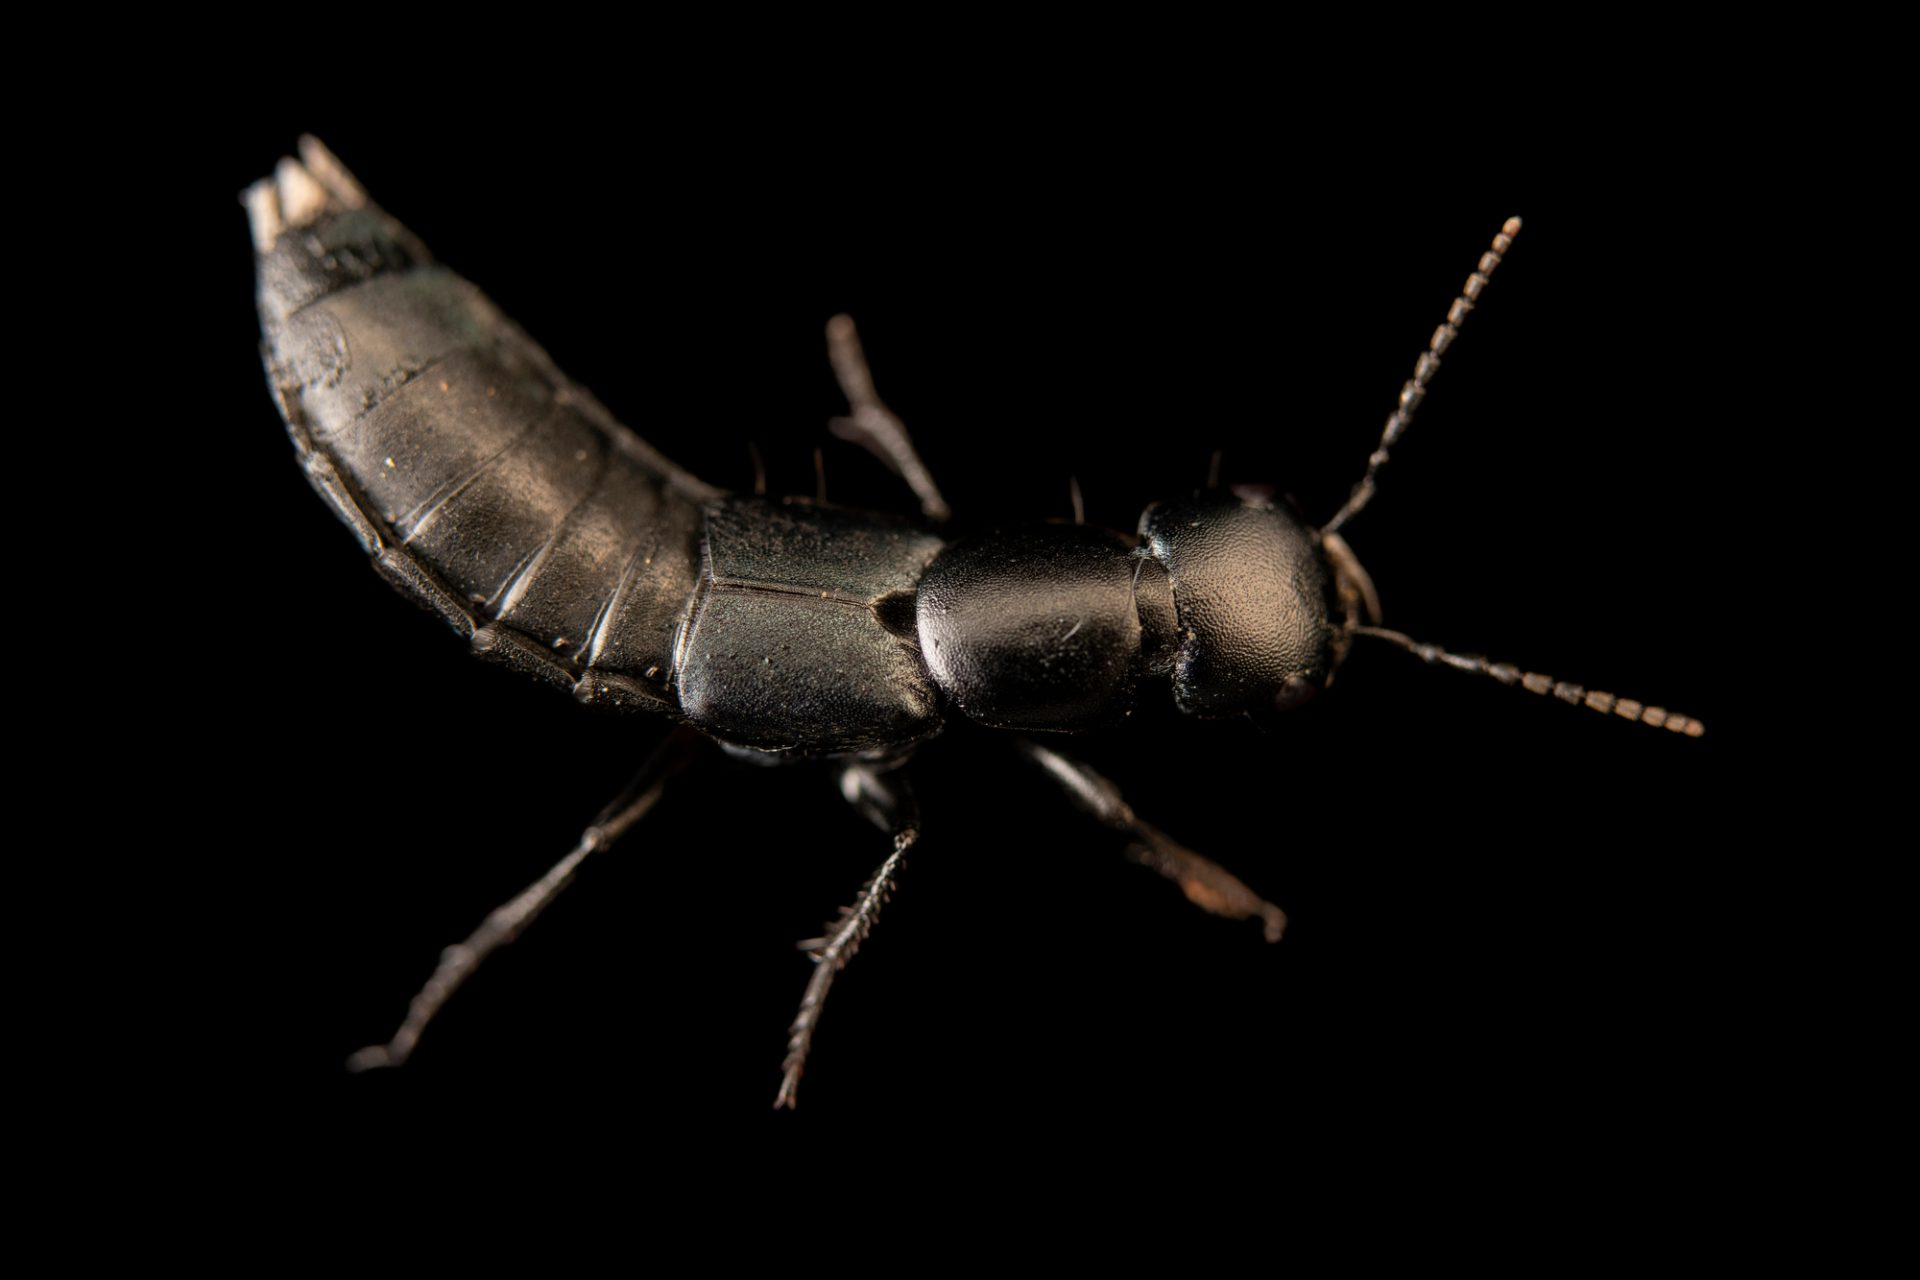 Photo: Devil's coach horse beetle (Ocypus olens) at Graham's Quinta dos Malvedos Vineyard.